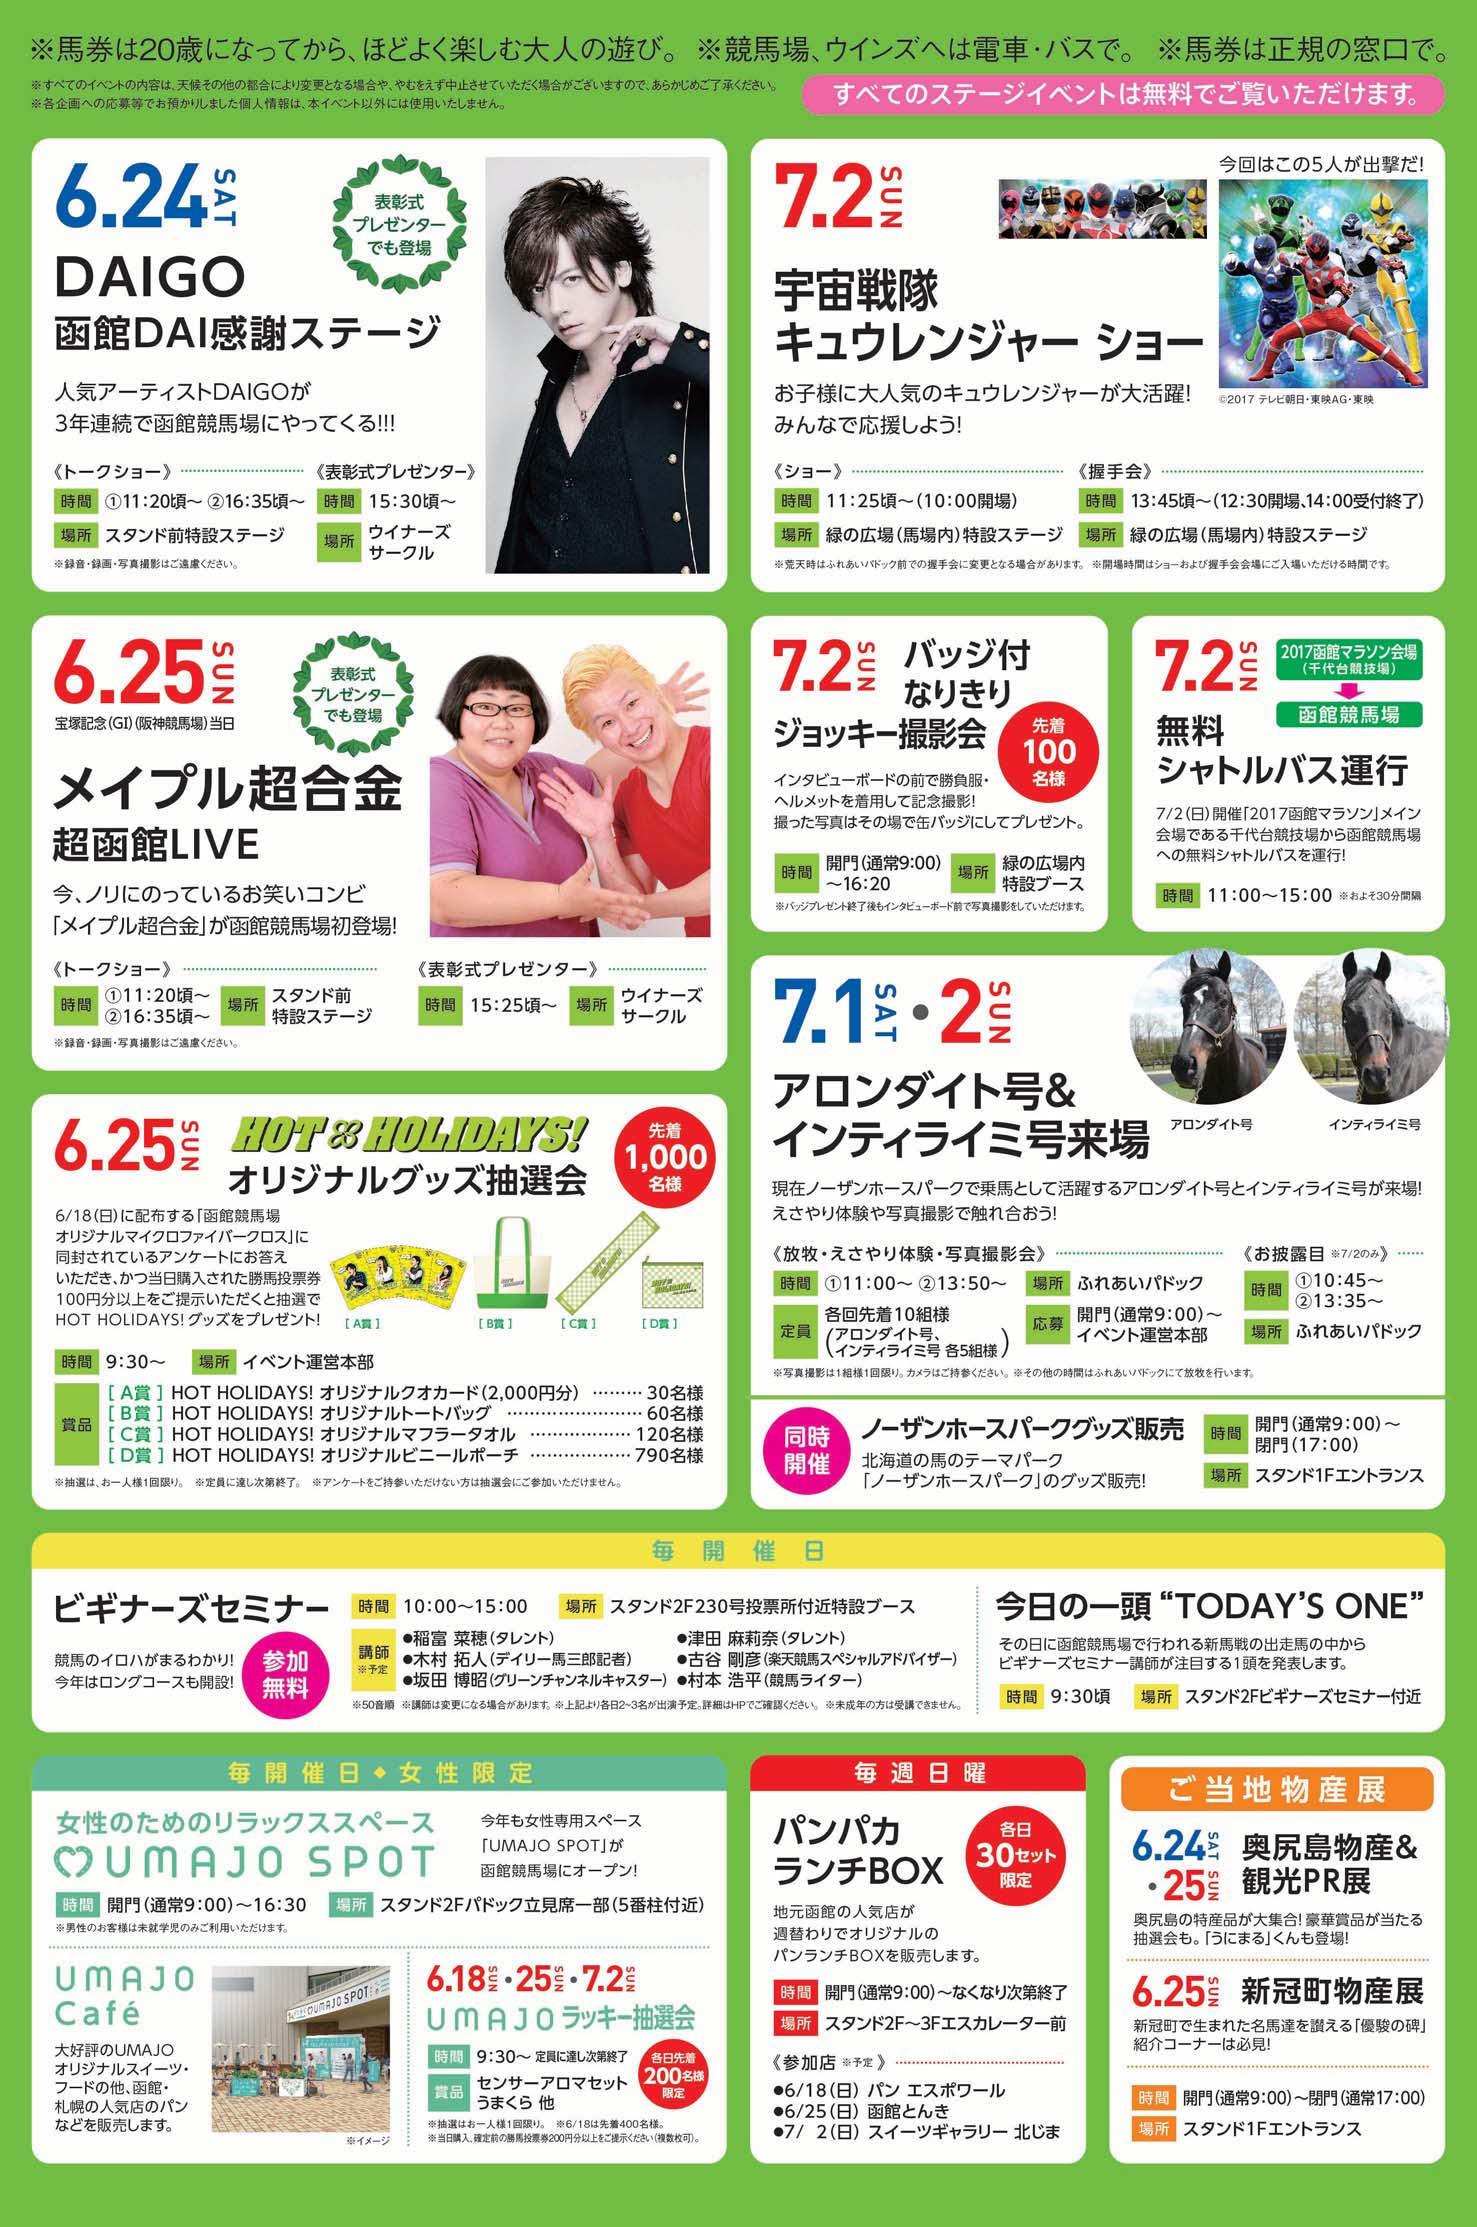 2017年07月函館競馬場イベント情報詳細03